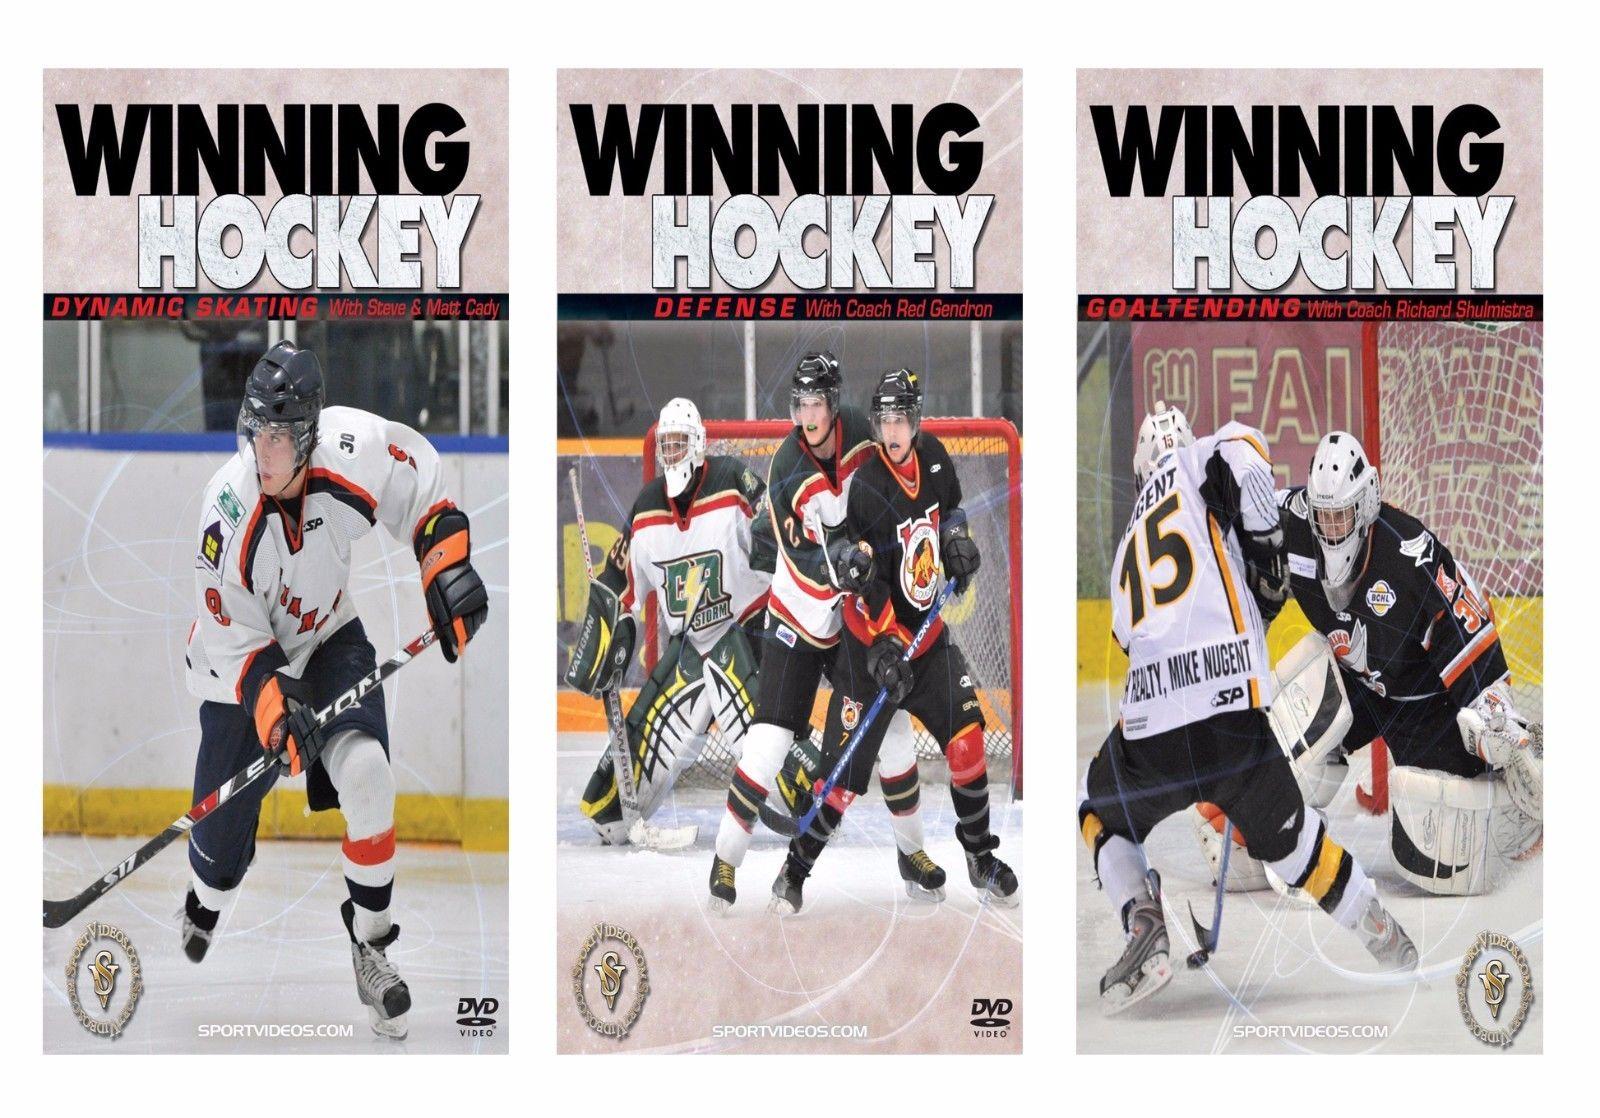 Winning Hockey 3 DVD Set  - Free Shipping